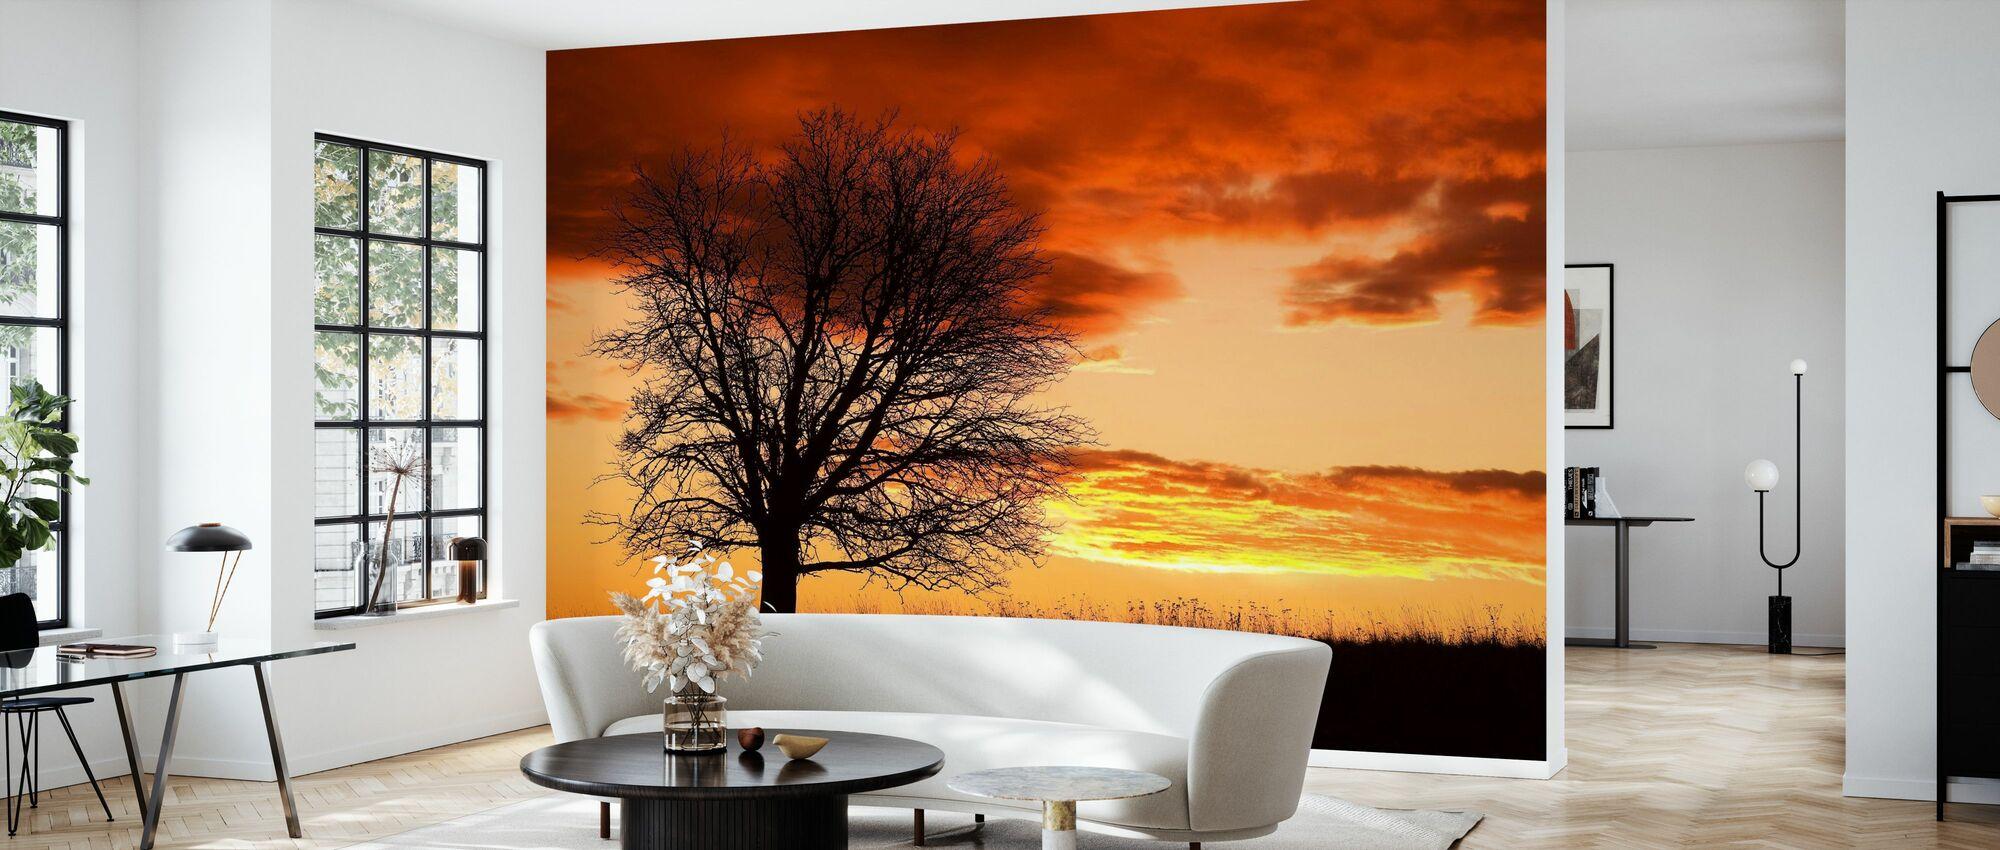 Boom in Sunset - Behang - Woonkamer